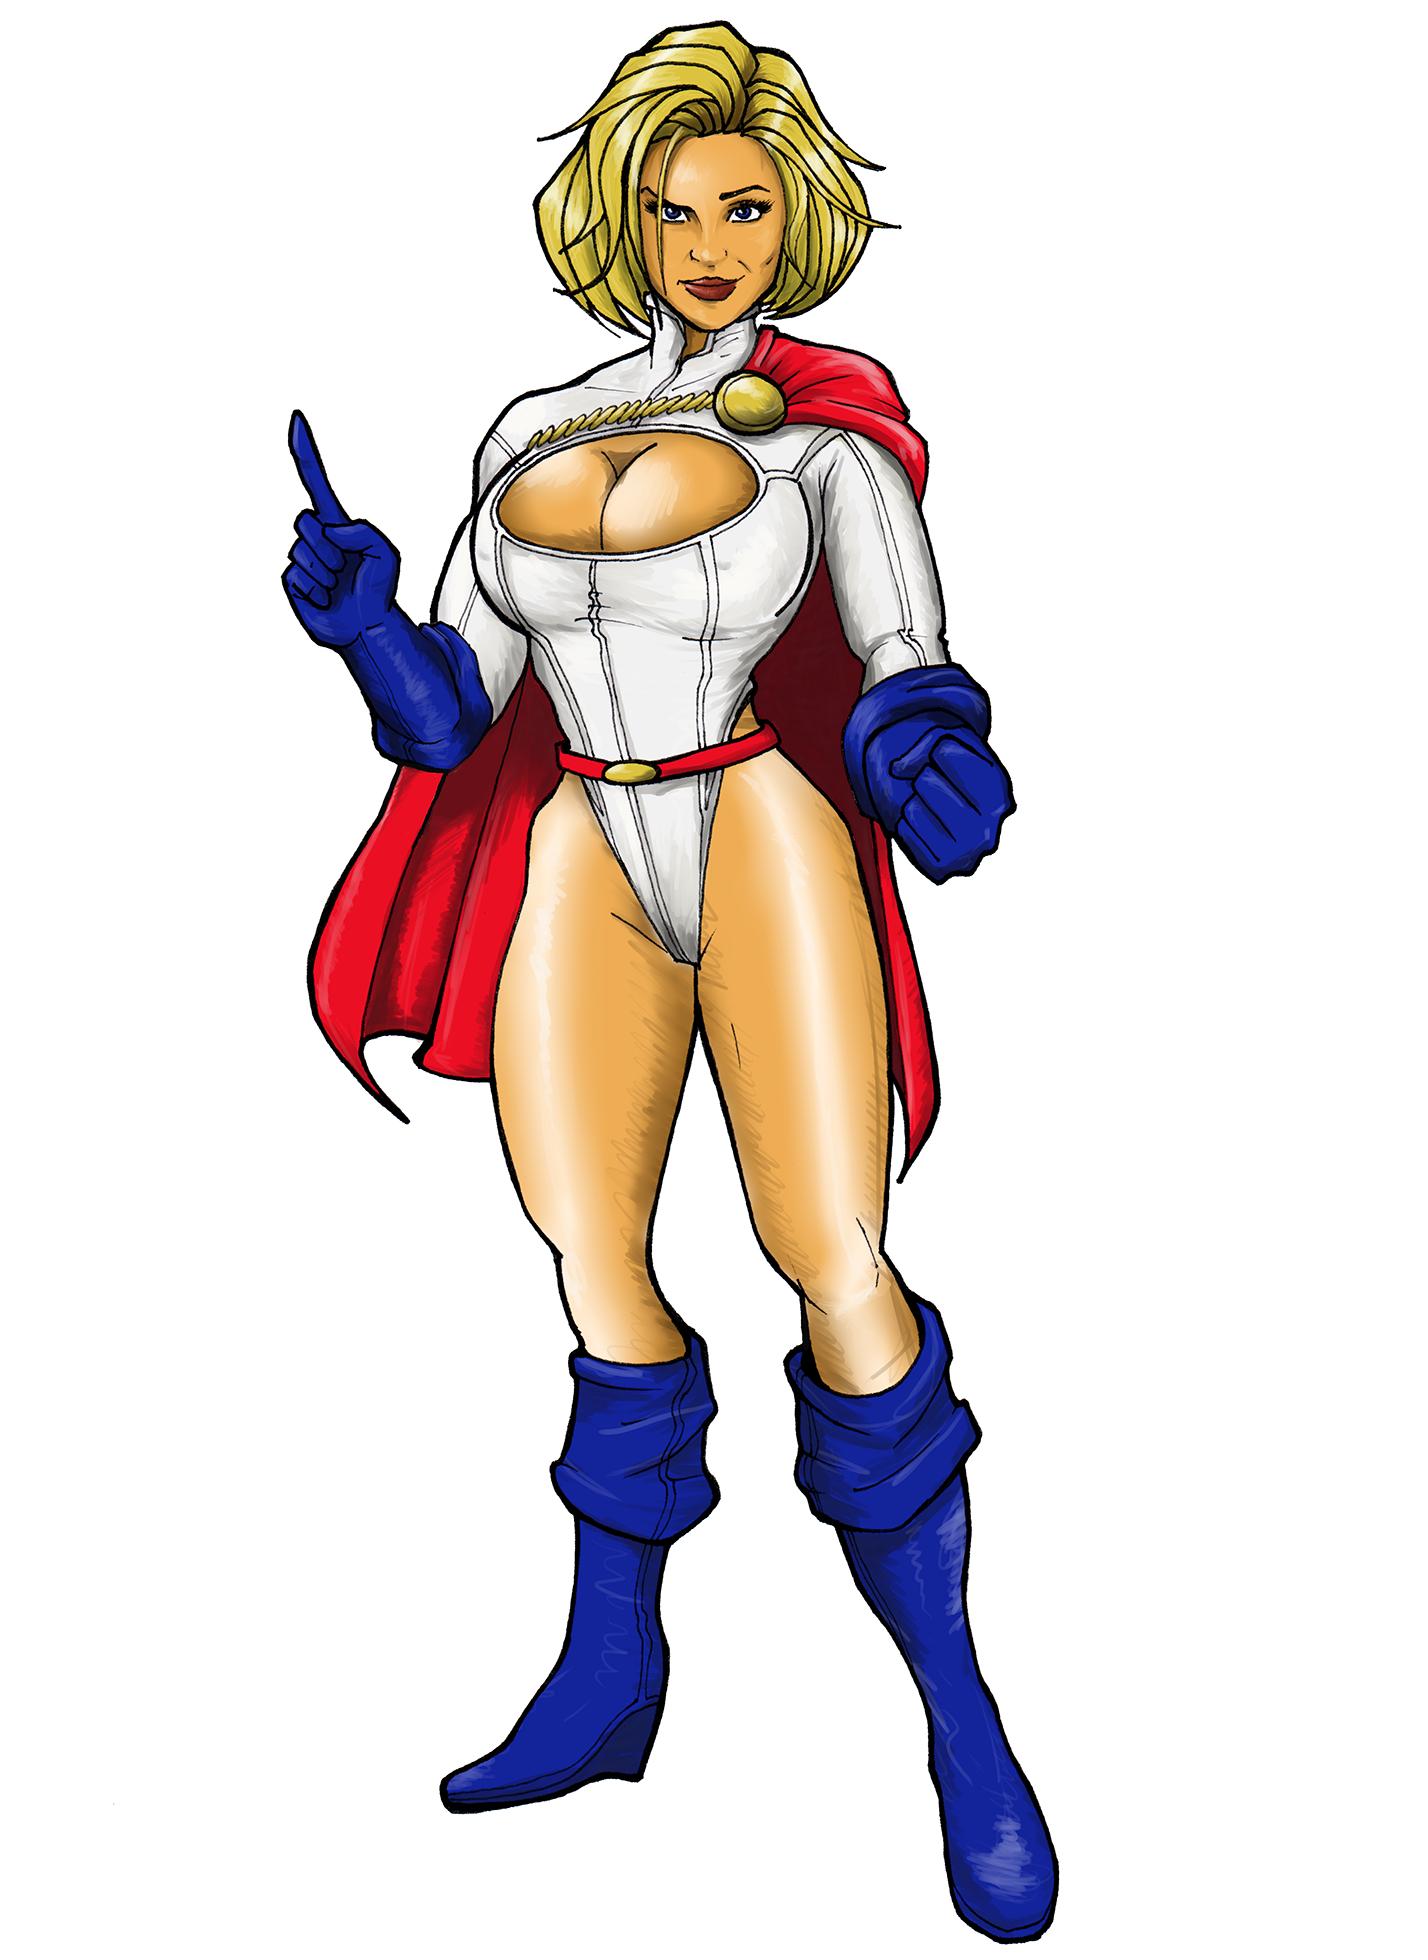 Power girl dc comics was